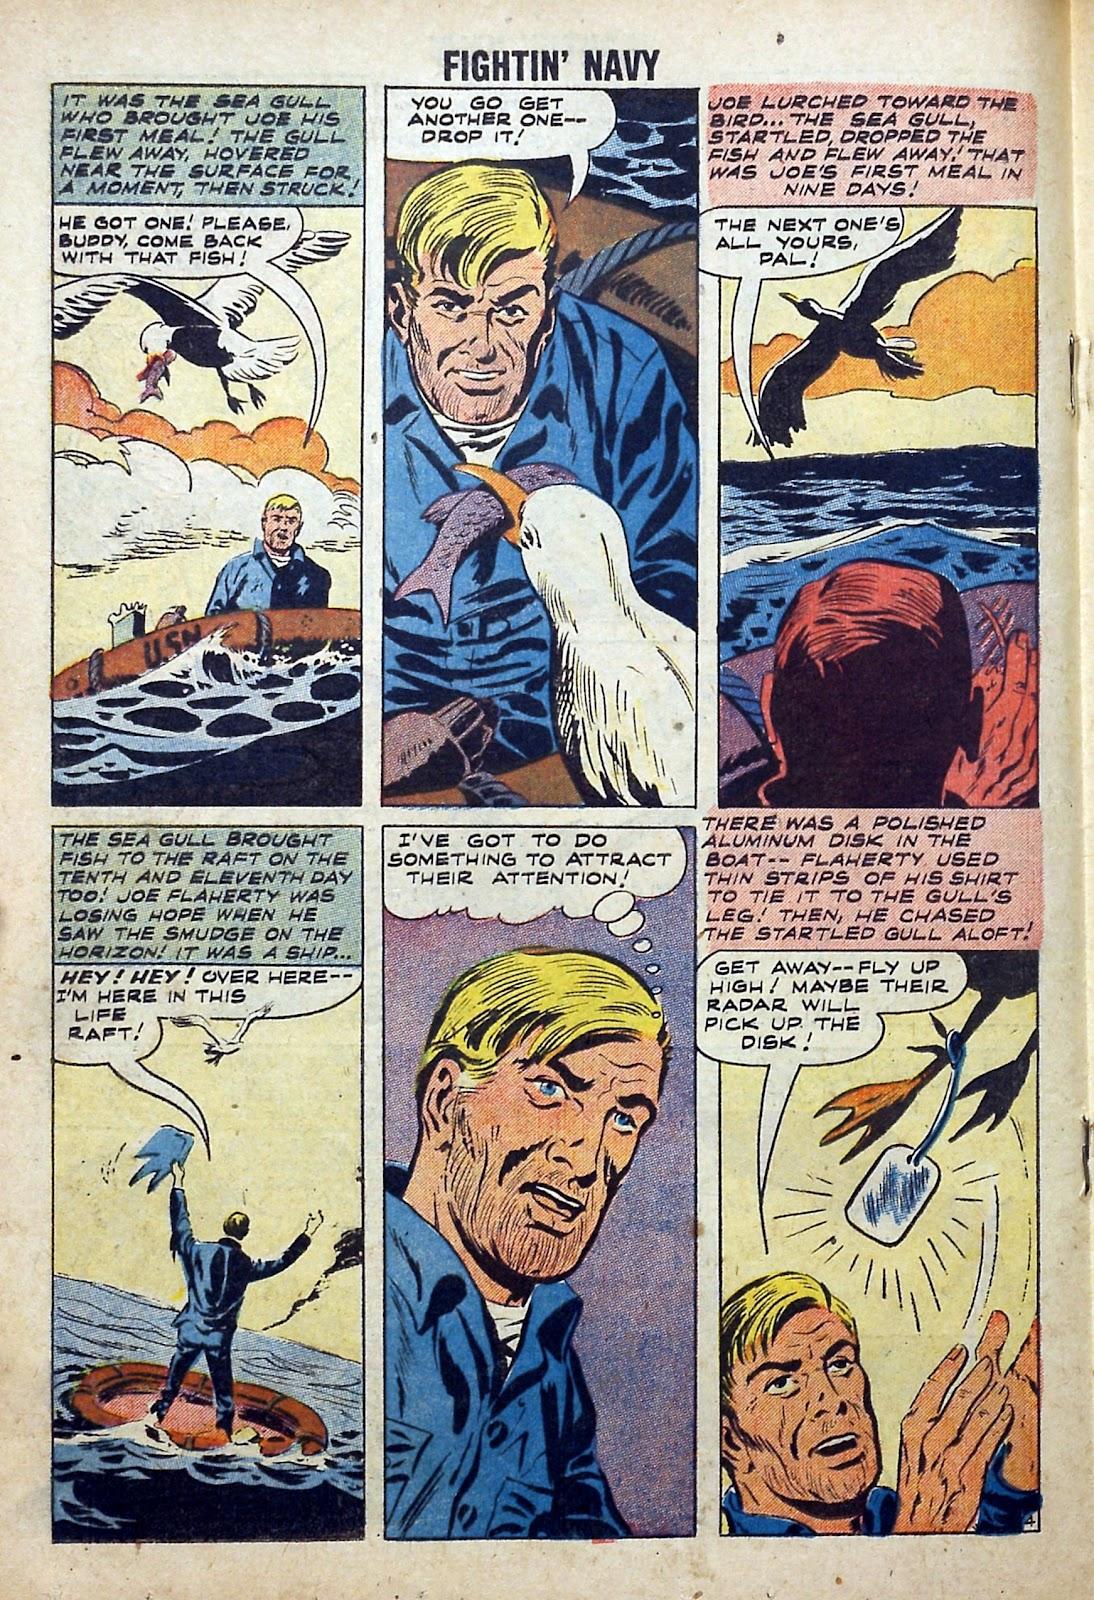 Read online Fightin' Navy comic -  Issue #84 - 18